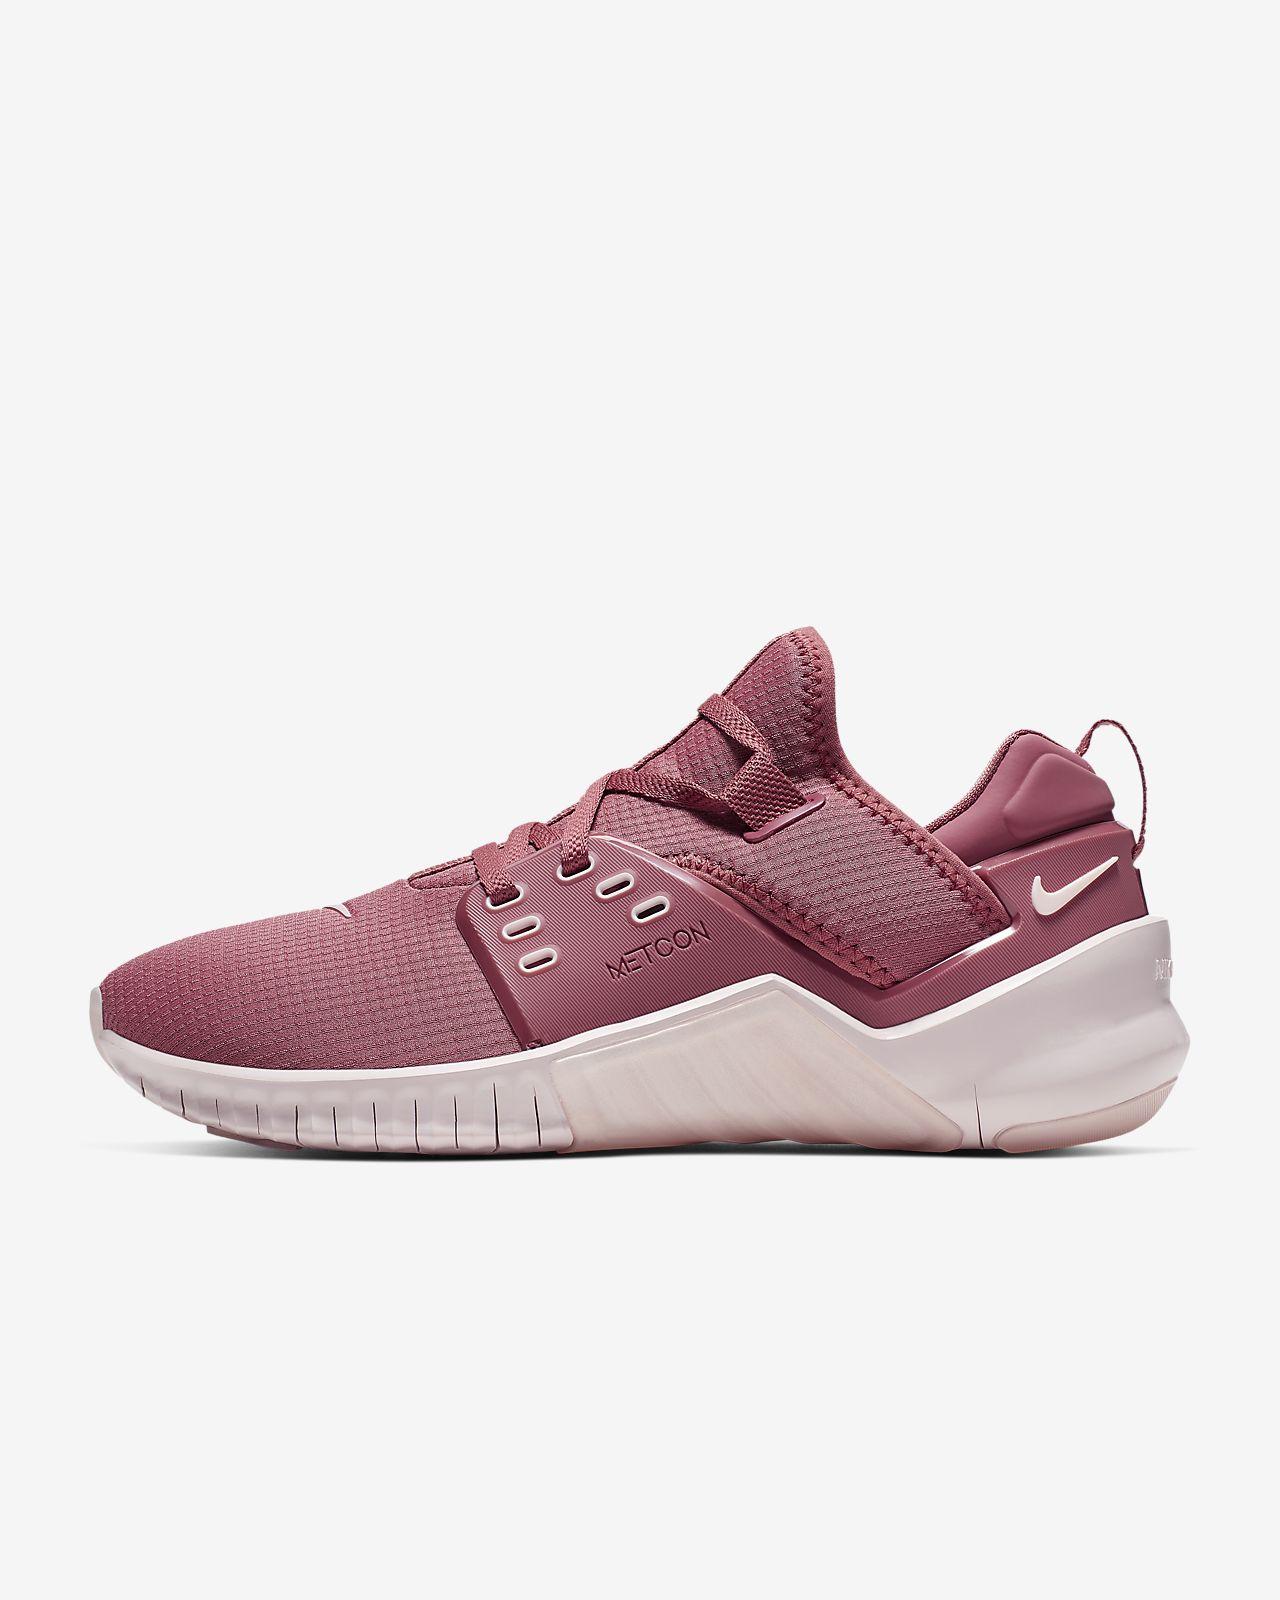 Chaussure de training Nike Free X Metcon 2 pour Femme